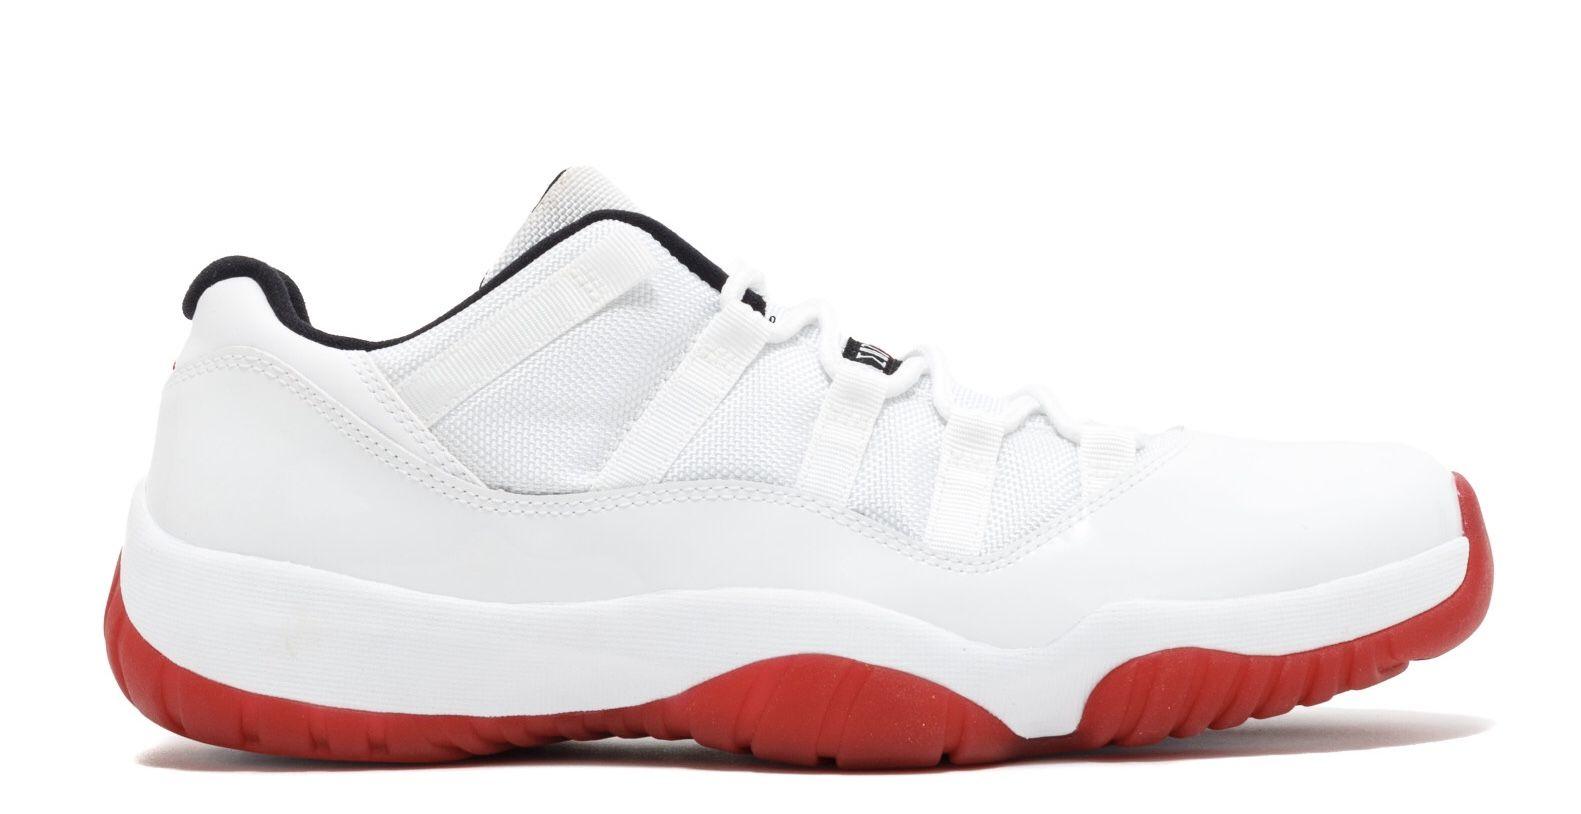 Jordan Retro 11 Low Red Bottom Jordan Retro 11 Low Red Bottoms Jordan Retro